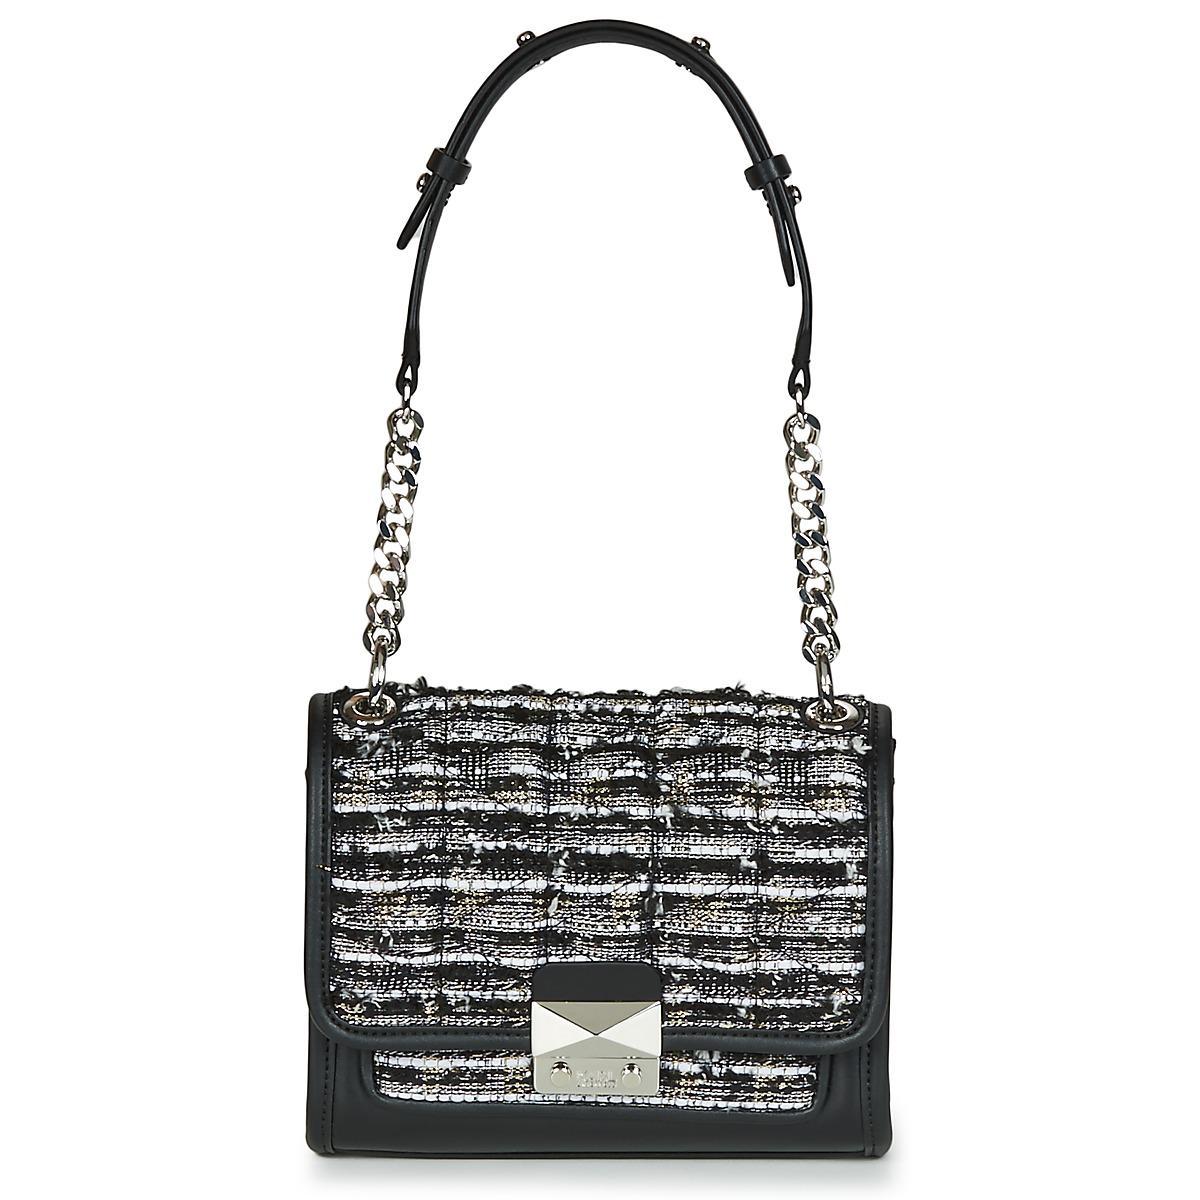 e45d1c11722d Karl Lagerfeld. K kuilted Tweed Small Handbag Women s Shoulder Bag In Black